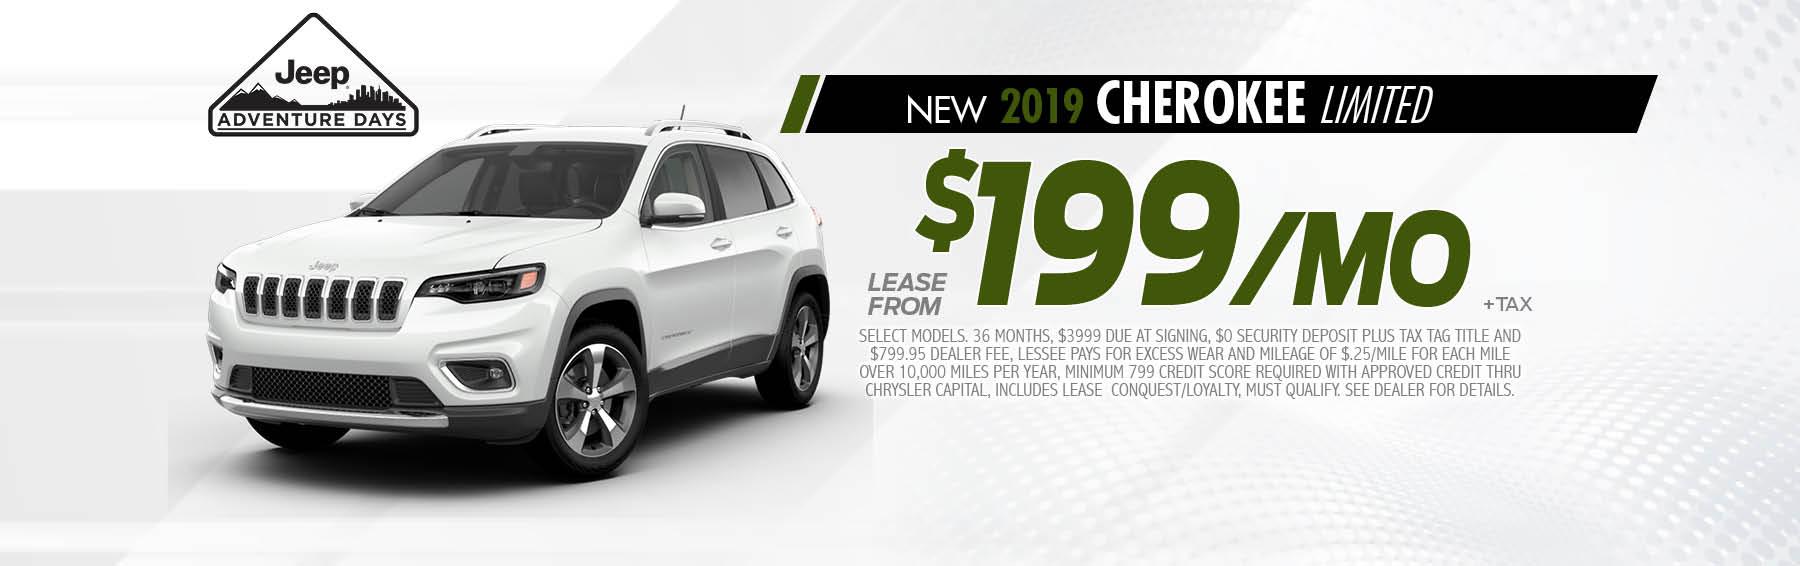 BMW Fort Pierce >> Chrysler, Dodge, Jeep, RAM Trucks Fort Pierce New and Used ...